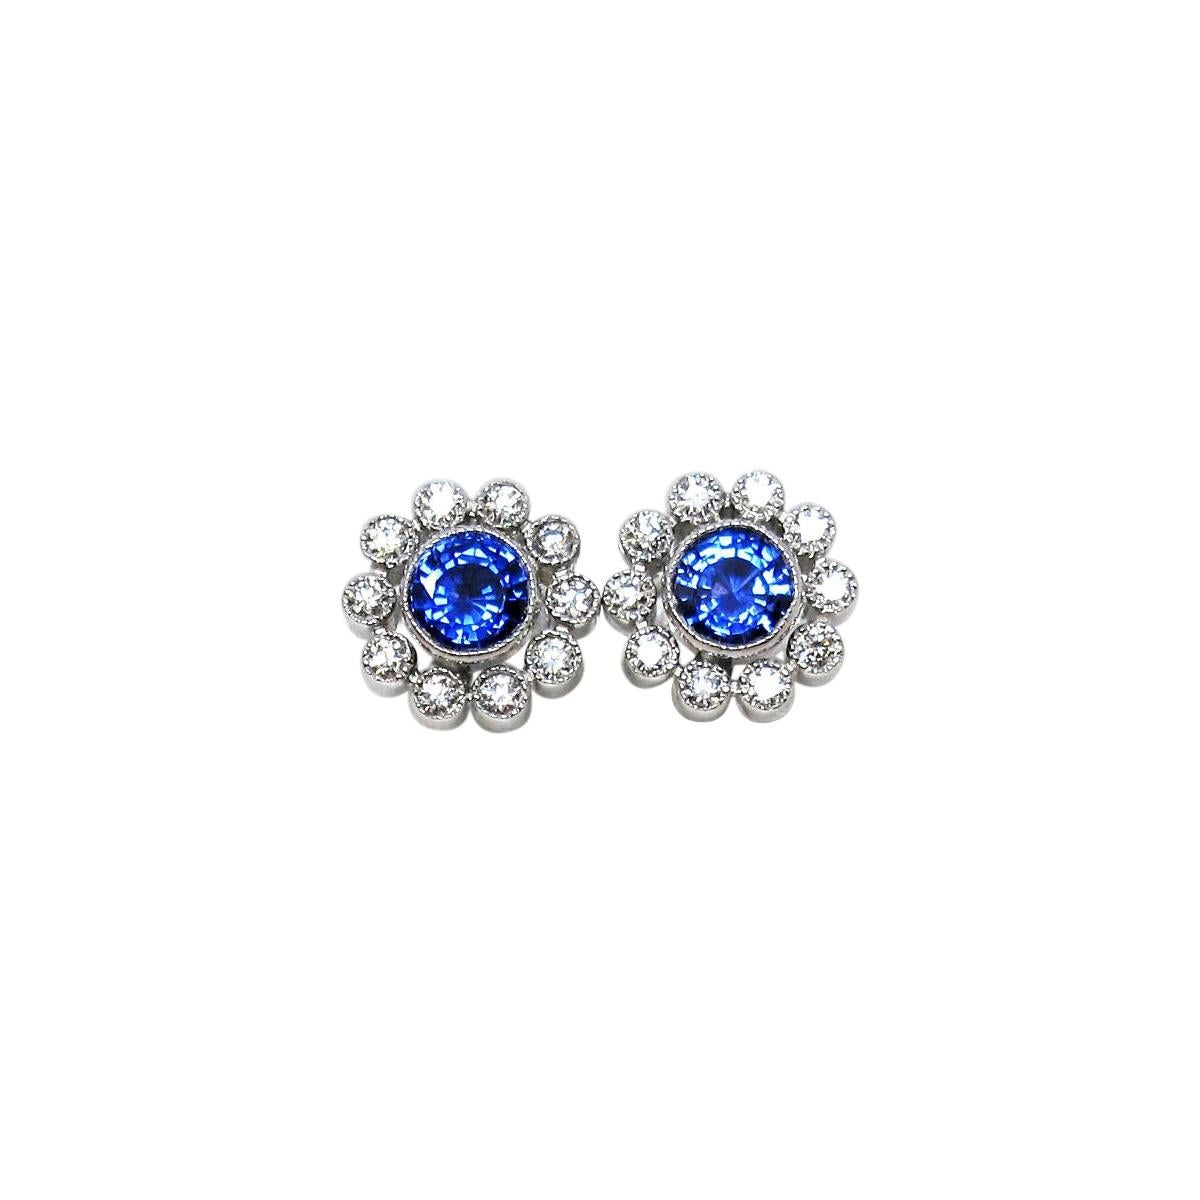 Tiffany & Co. Sapphire and Diamond Halo Stud Earrings Platinum .80 Carats Total